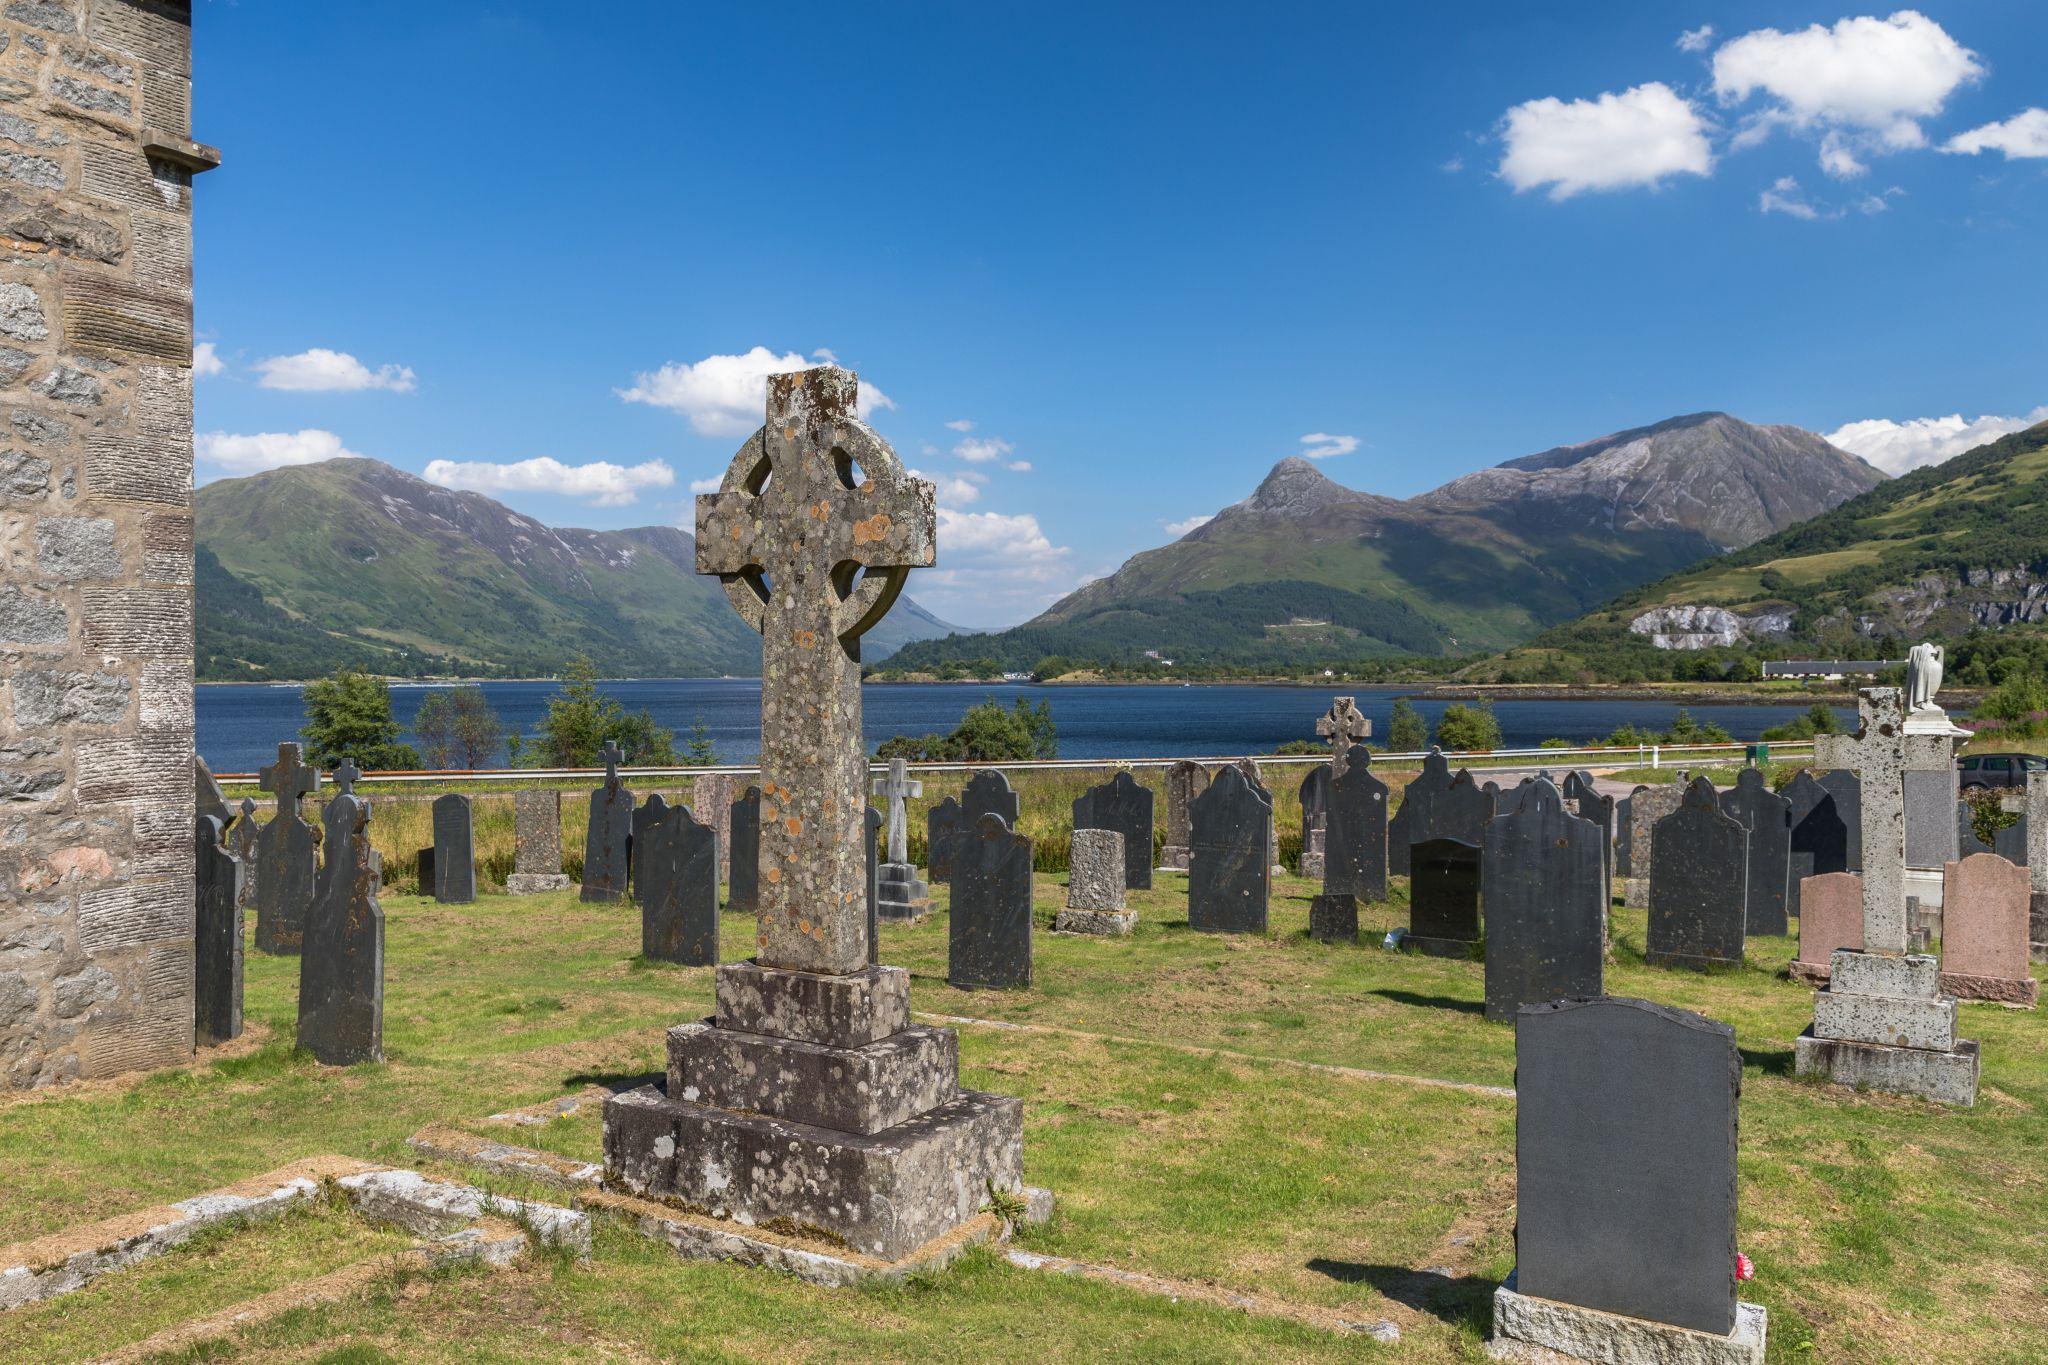 Pap of Glencoe from St. Johns Church, Ballachulish, United Kingdom